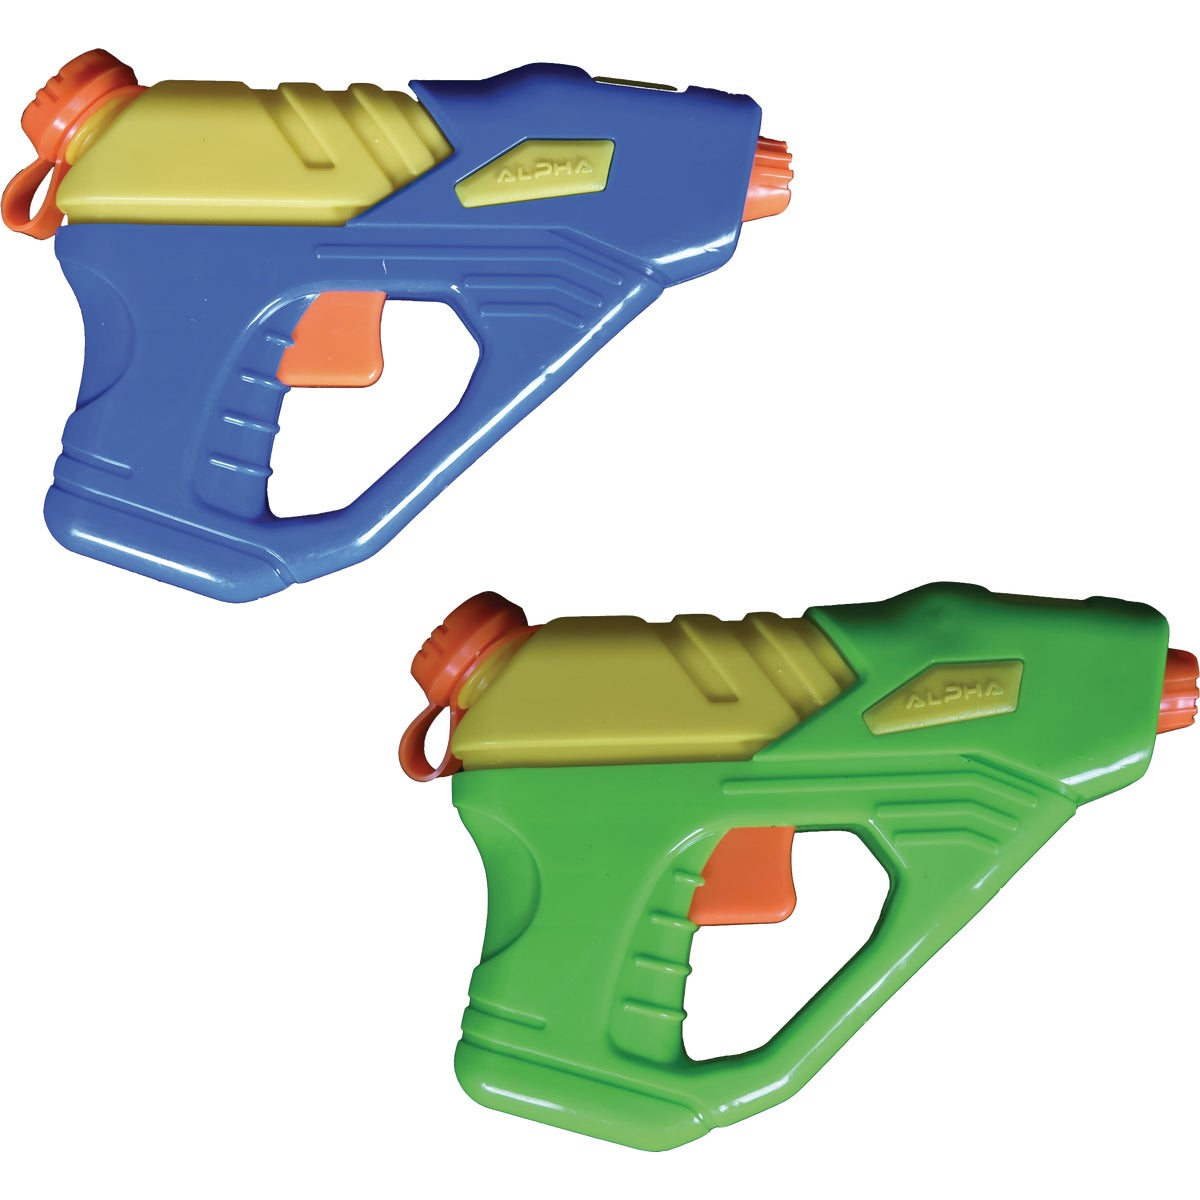 DBL WATER GUN - 81000 by Water Sports Llc